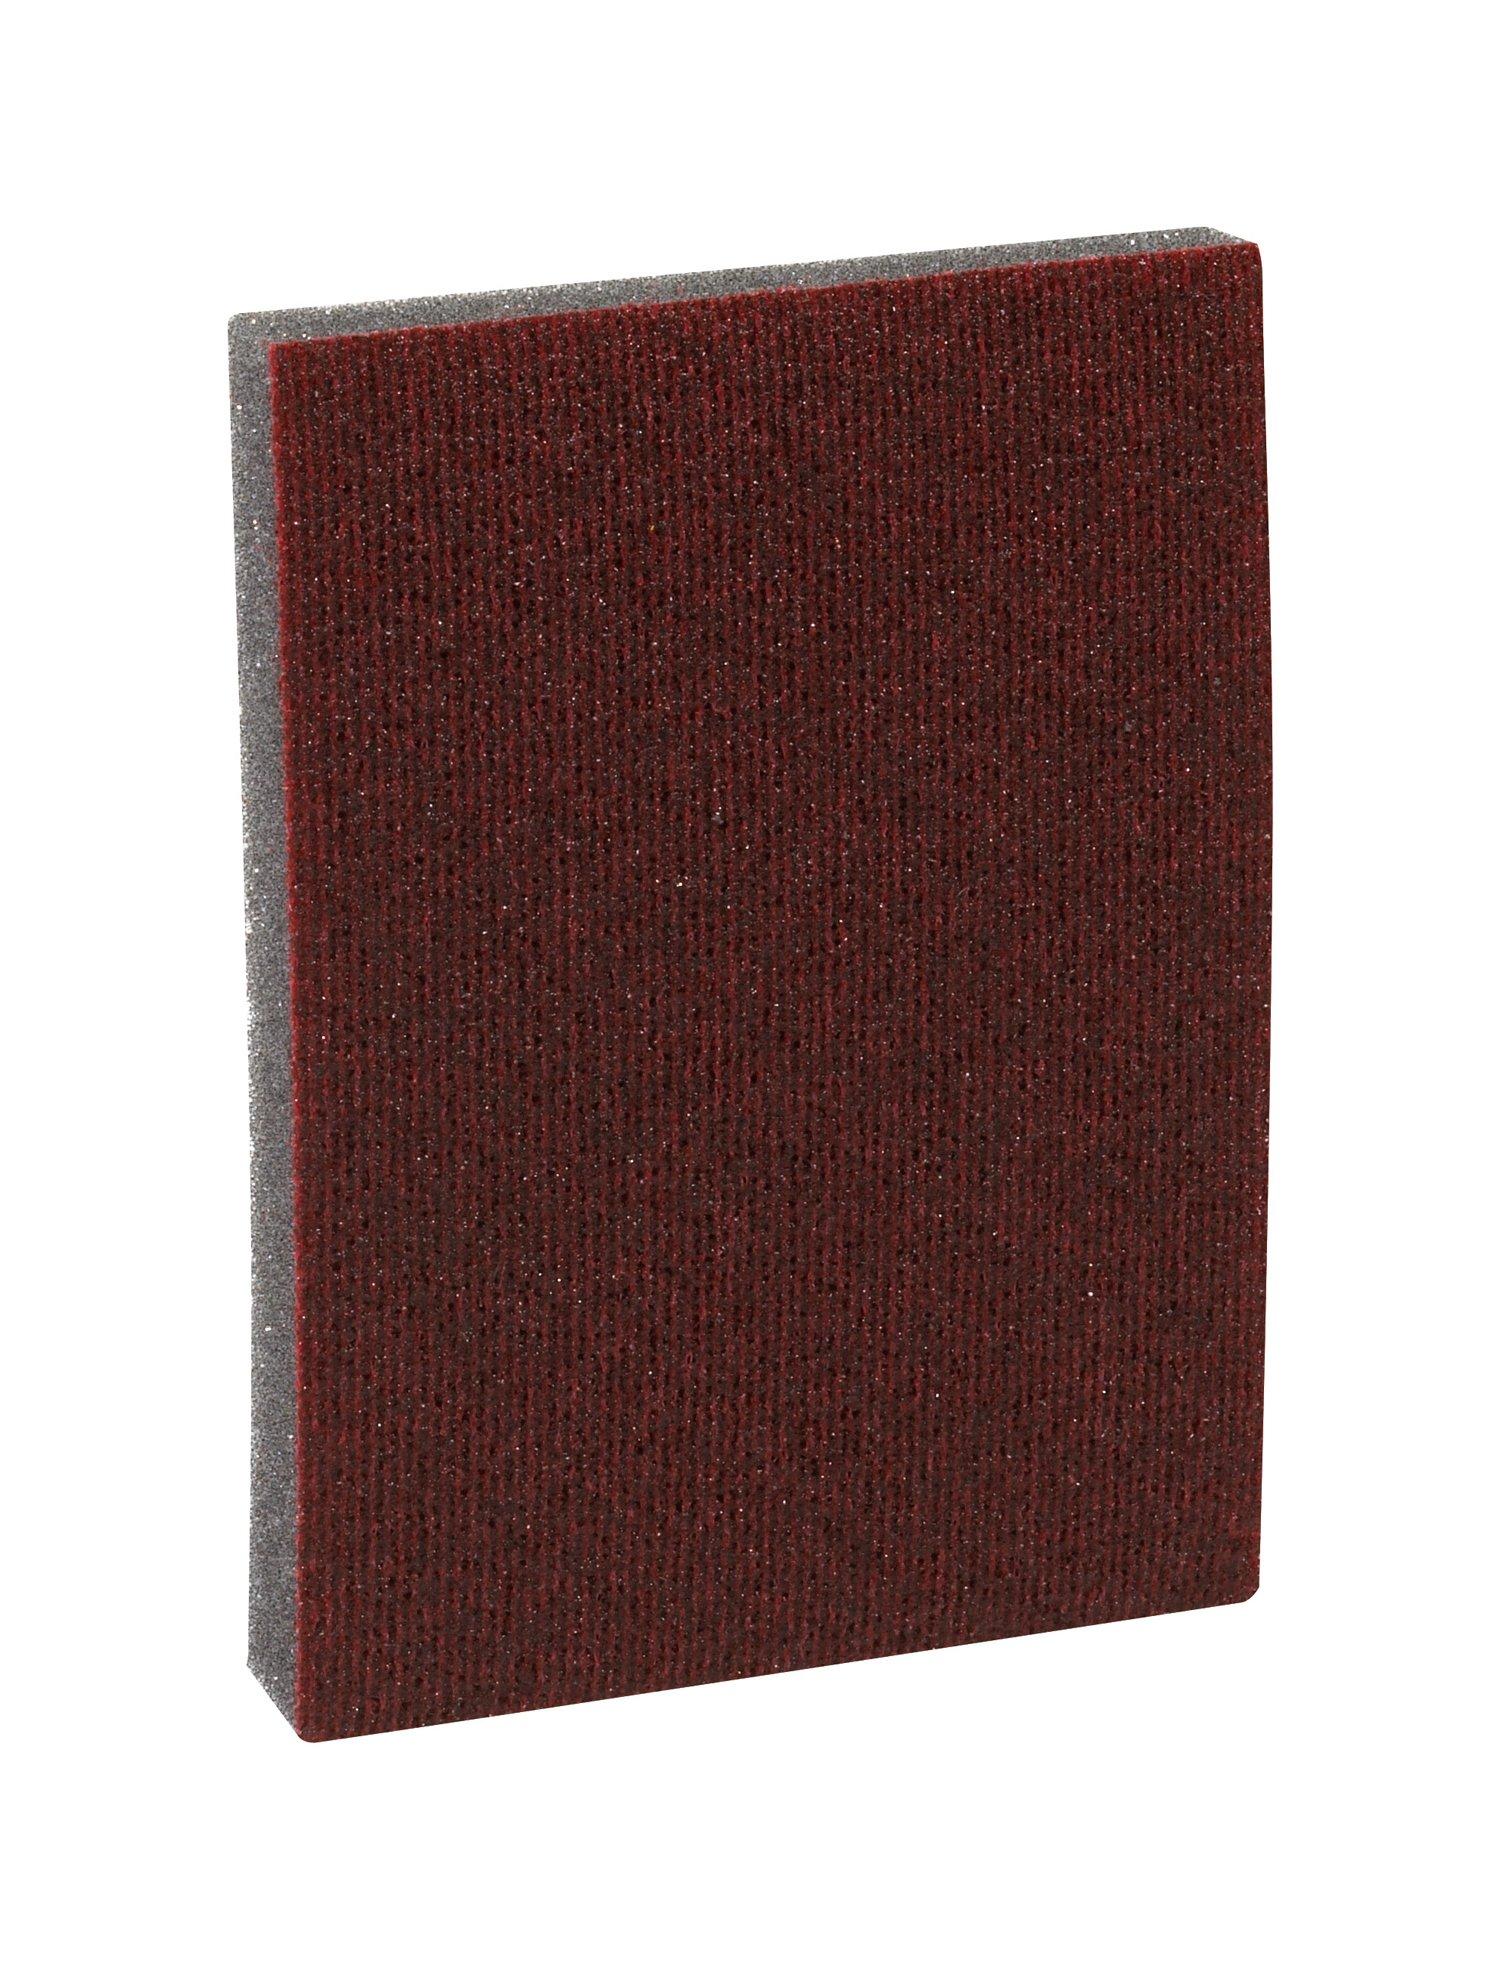 Fine Grit 3M Between Coats Sanding Sponge 4.5-Inch by 5.5-Inch